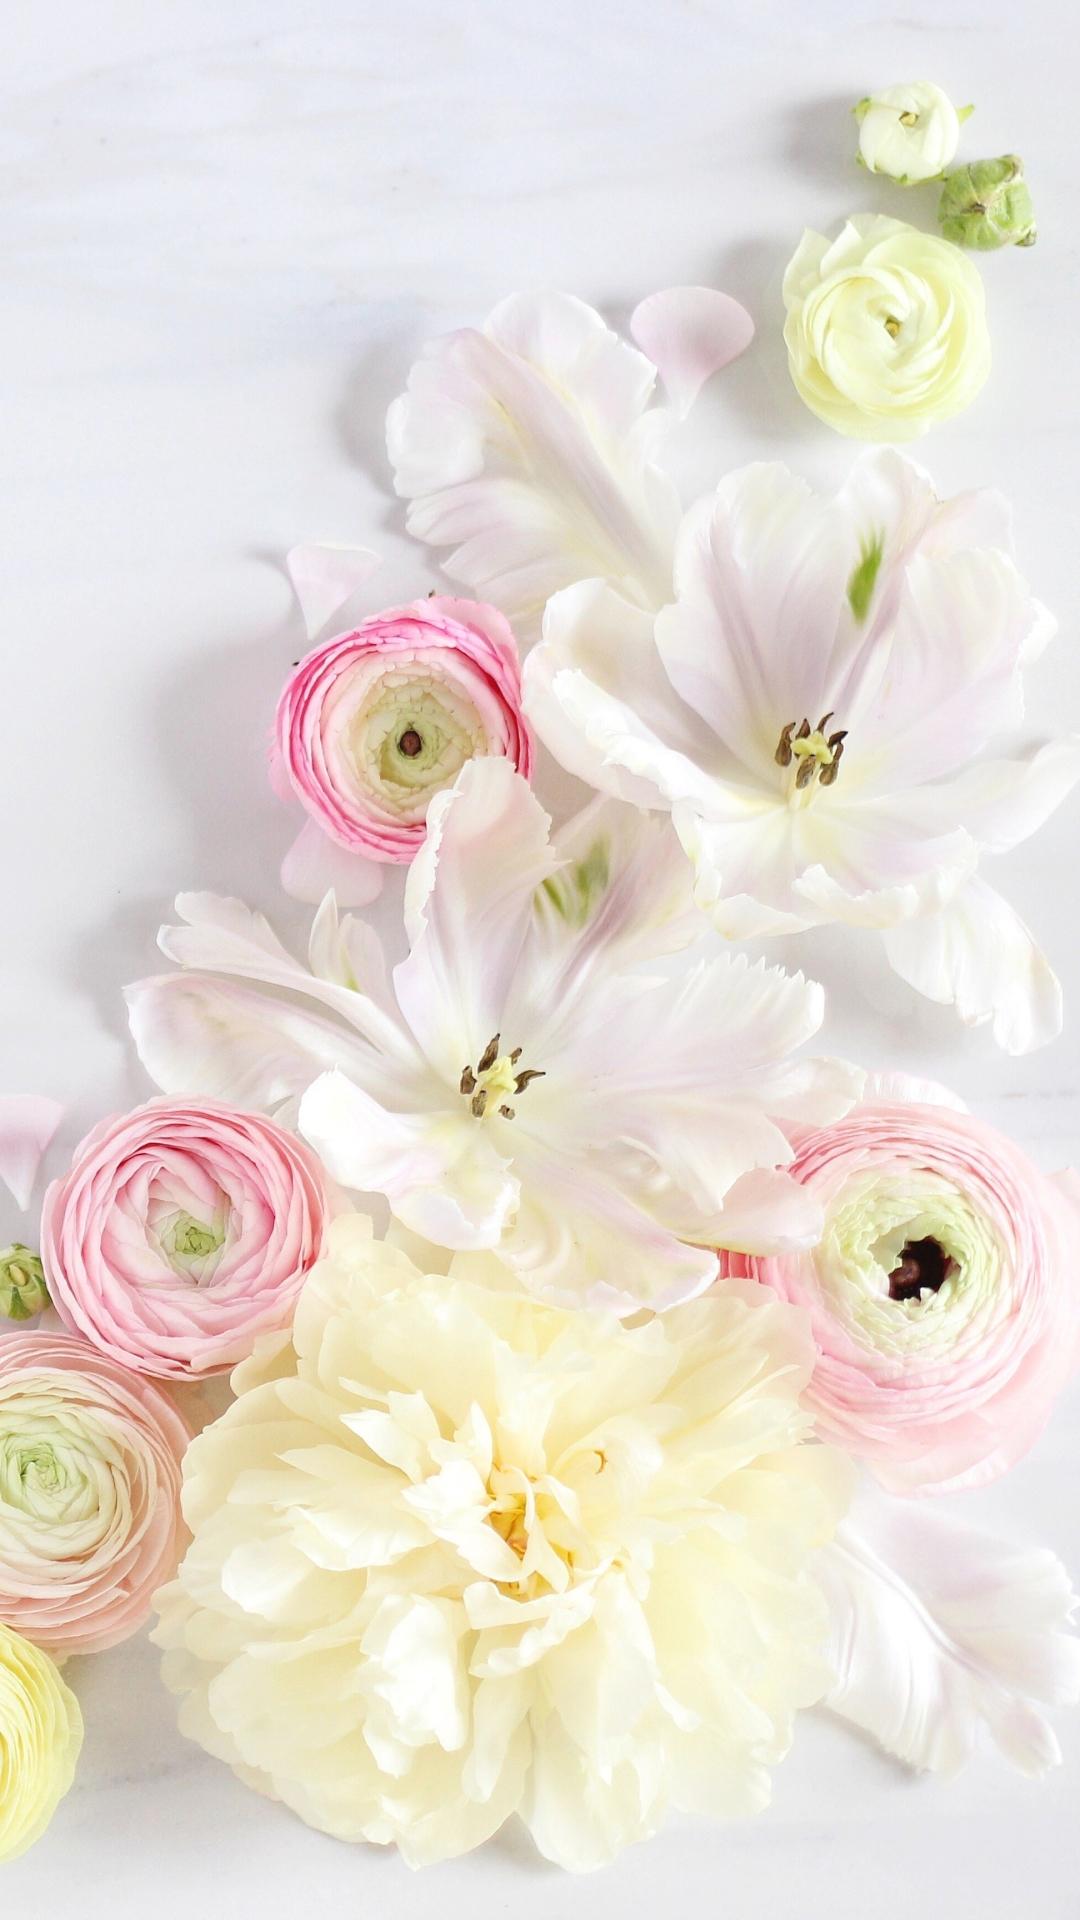 Artistic / Flower Mobile Wallpaper - Iphone 7 Wallpaper Flower , HD Wallpaper & Backgrounds